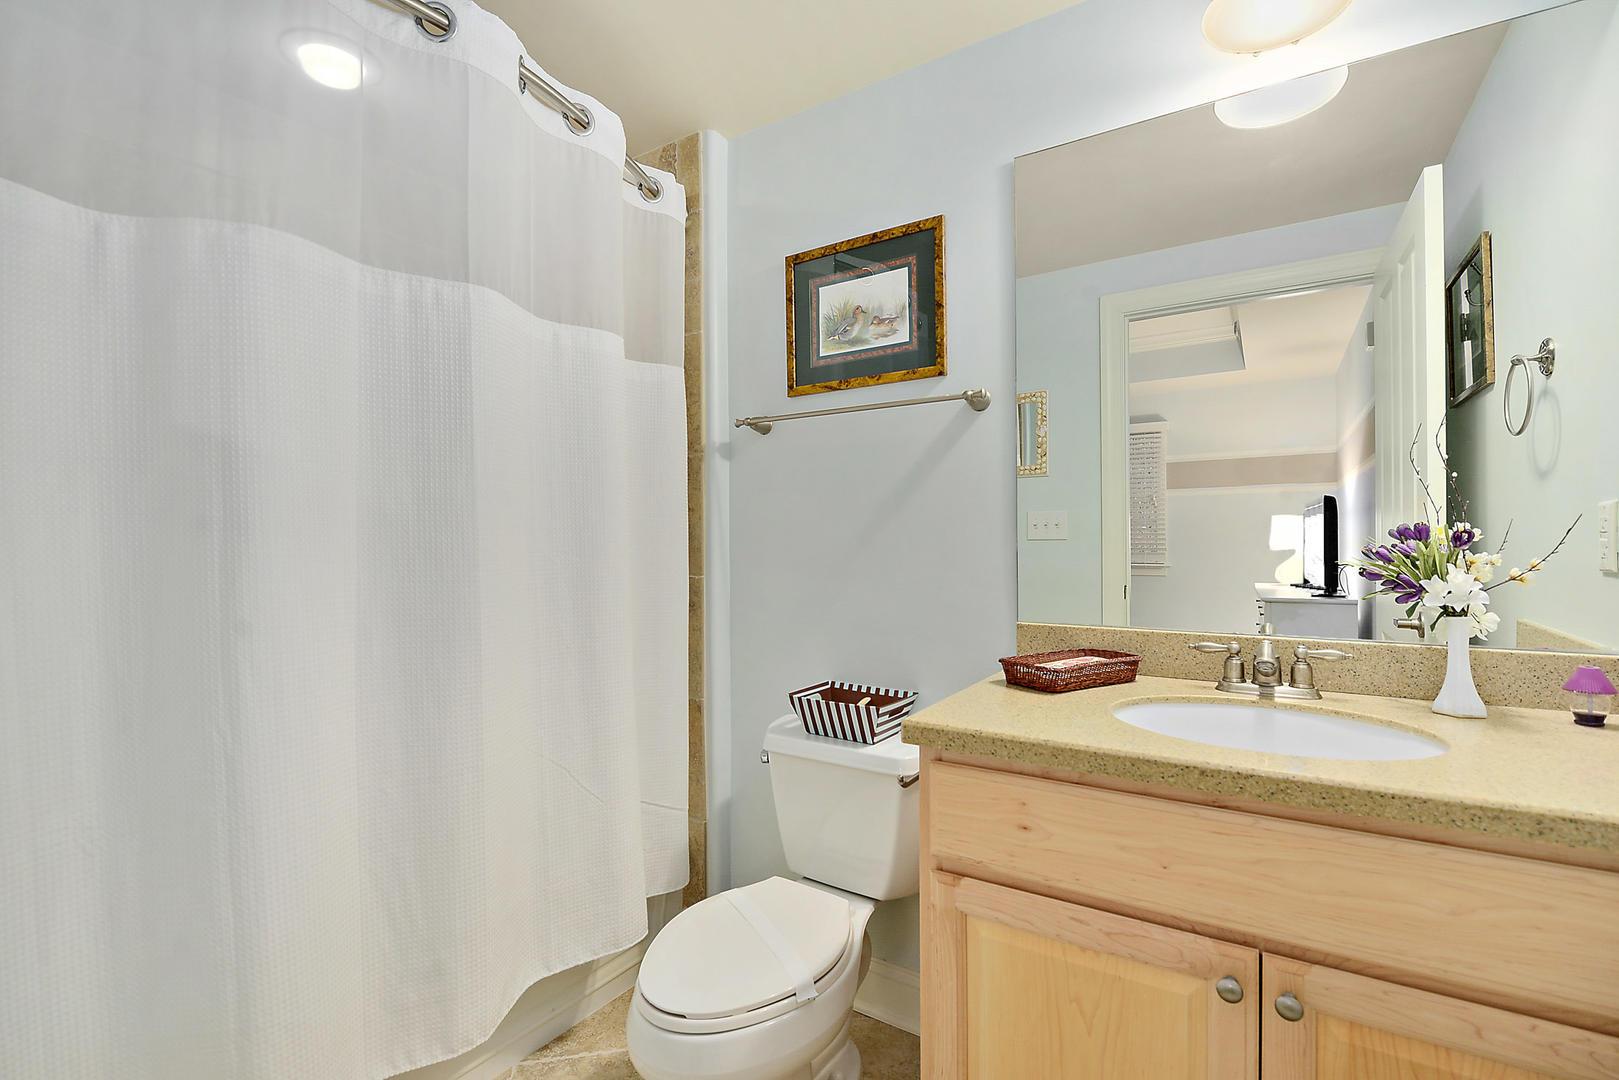 Rivendell 710 - Bathroom 3